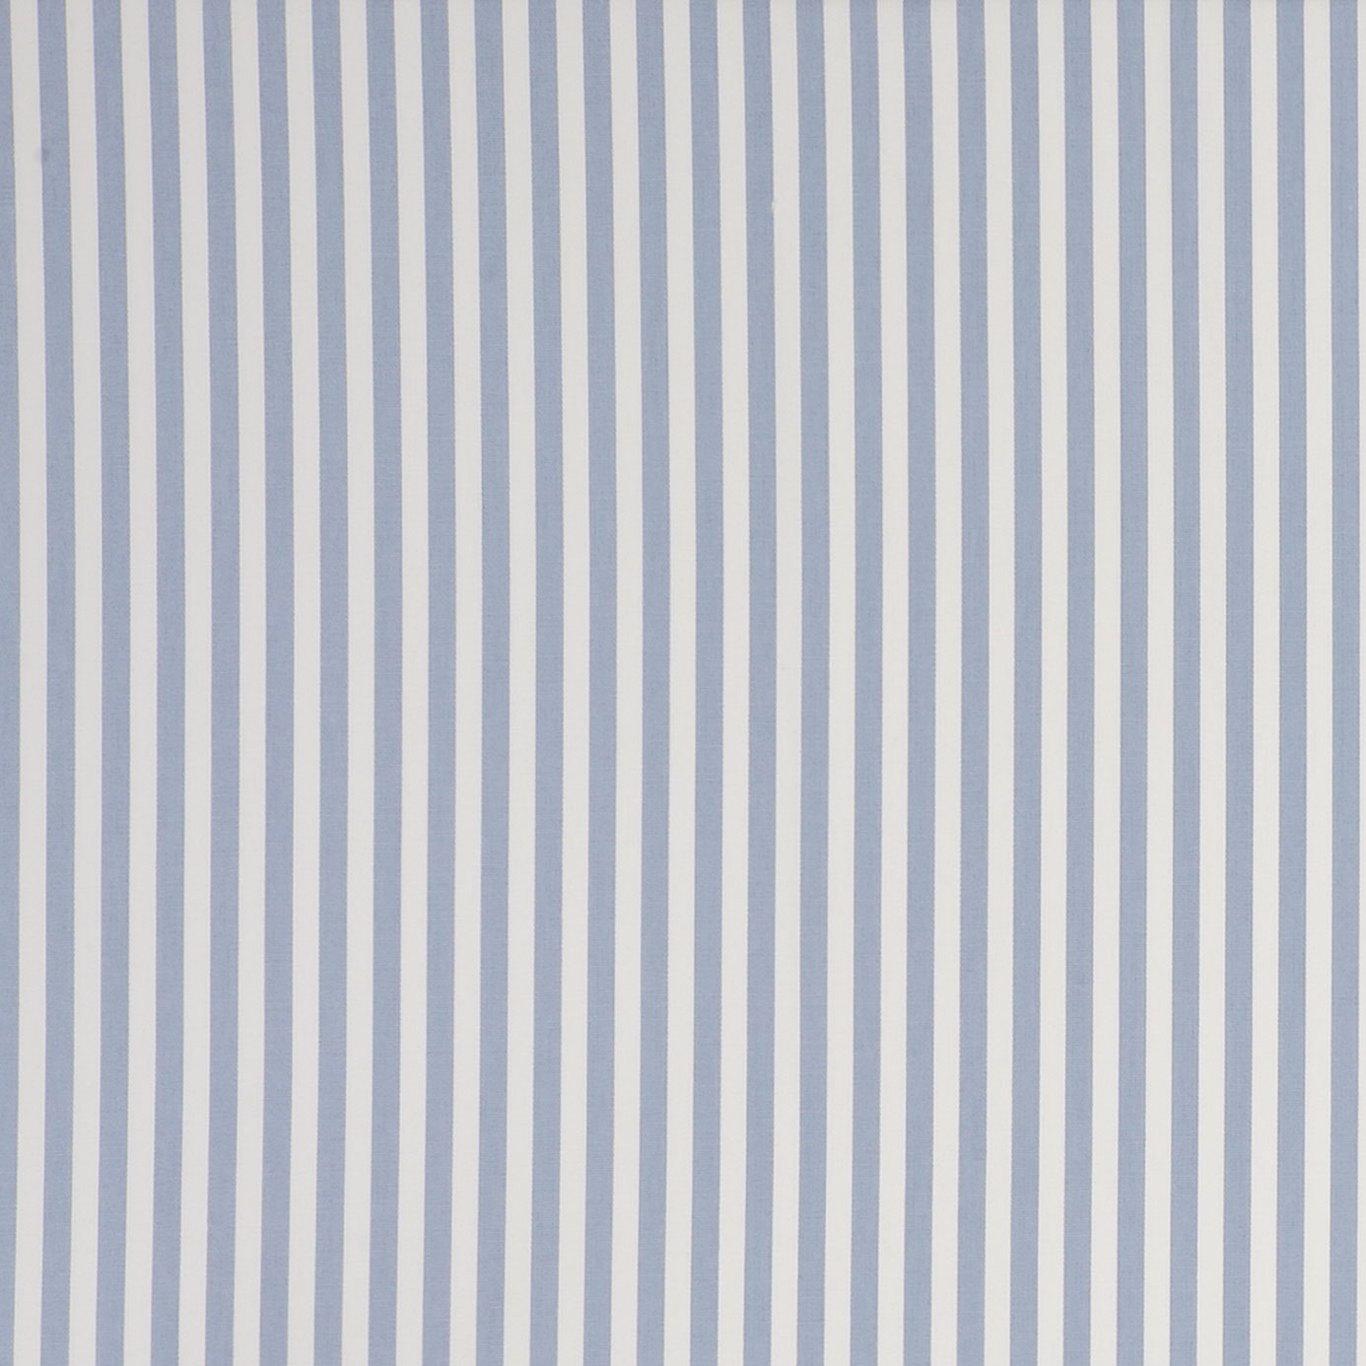 Party Stripe by STG